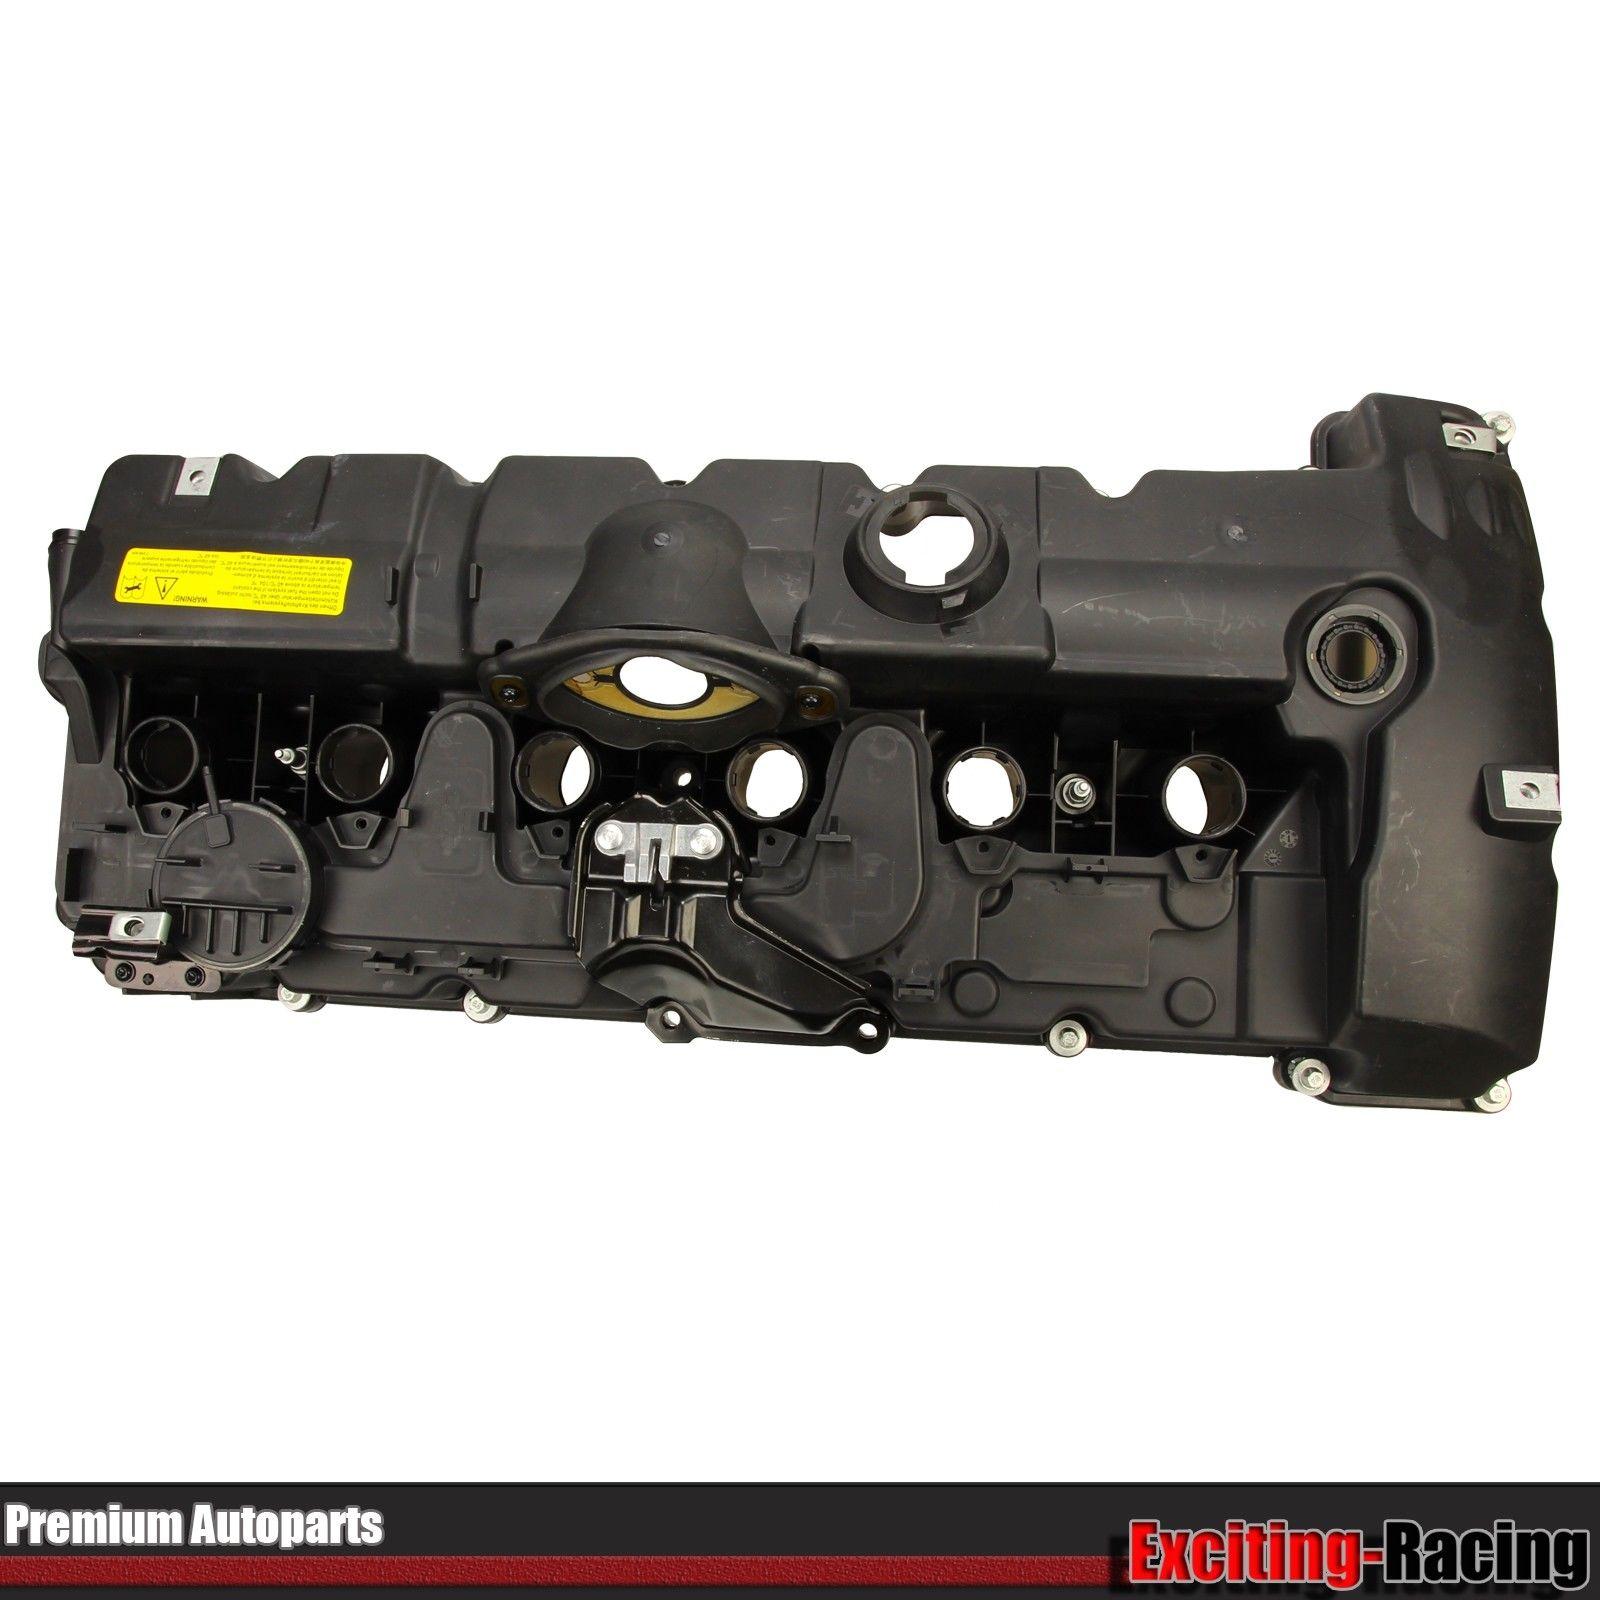 New Engine Valve Cover 11127552281 For BMW E82 E90 E70 Z4 X3 X5 128i 328i 528i